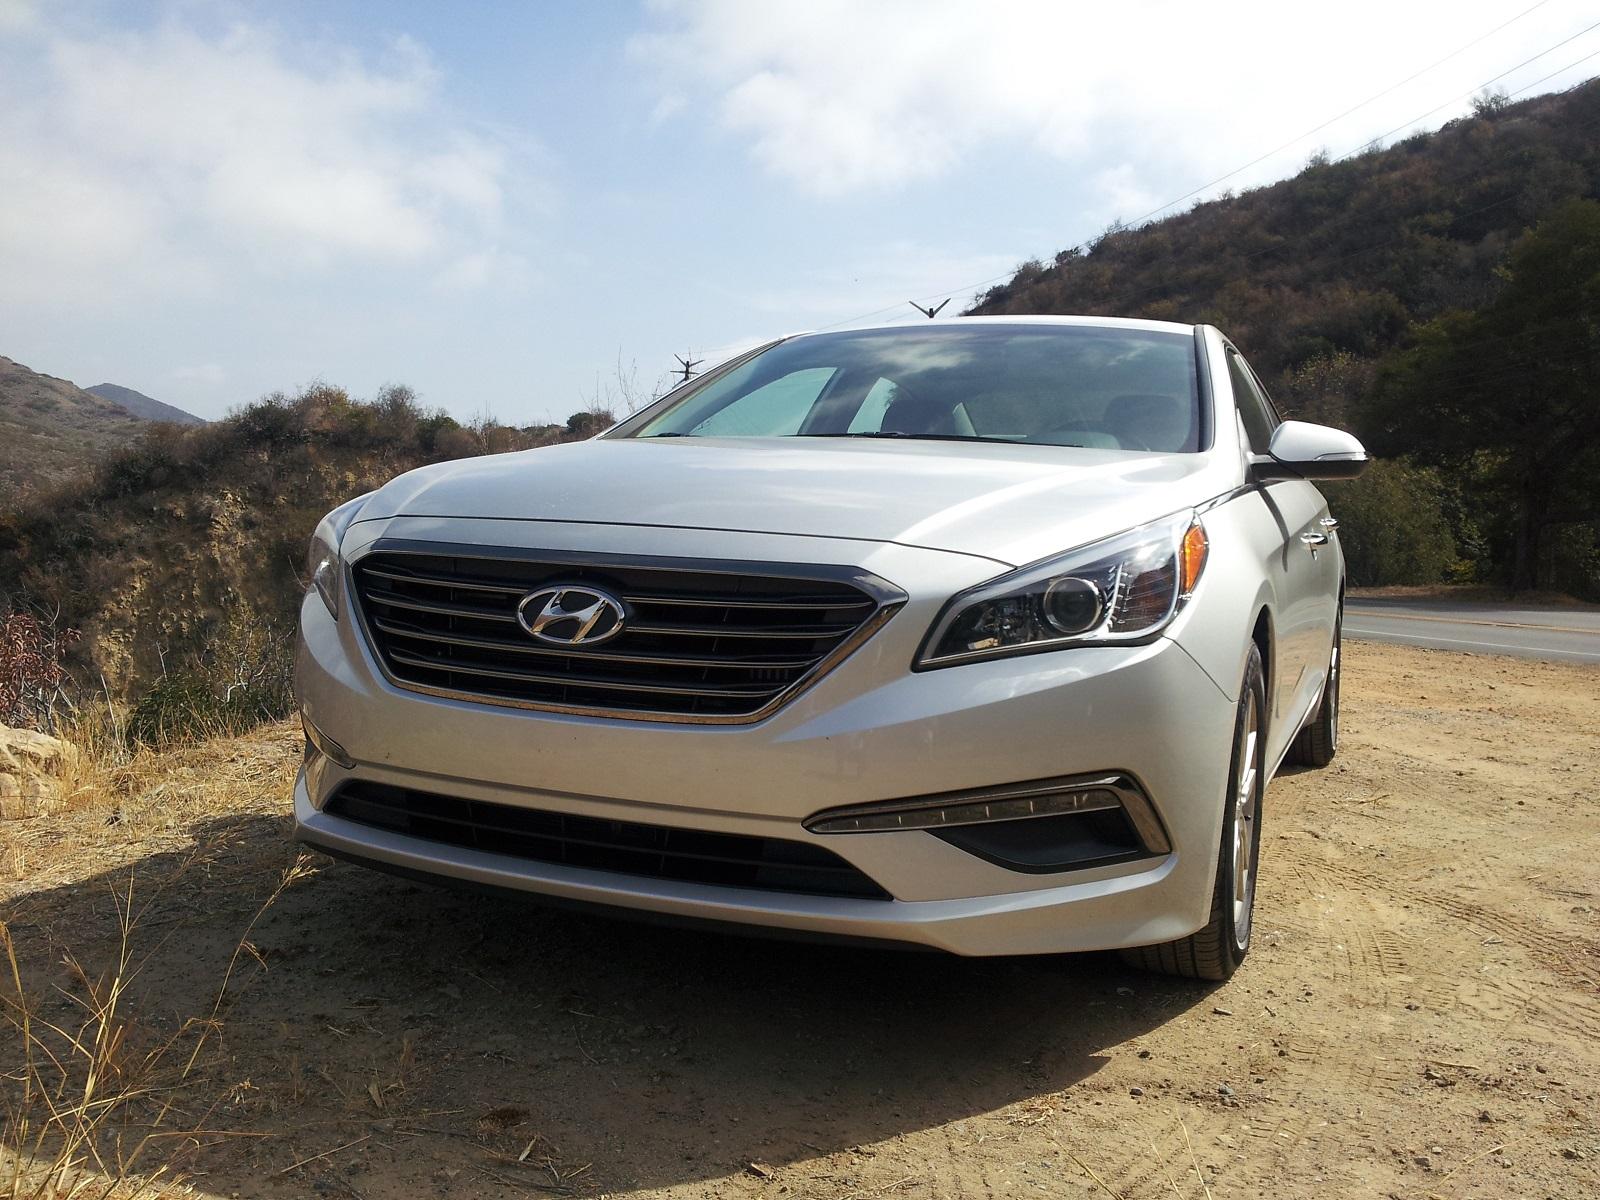 2015 hyundai sonata limited review car reviews - 2015 Hyundai Sonata Eco Quick Drive Of Higher Gas Mileage Small Turbo Four